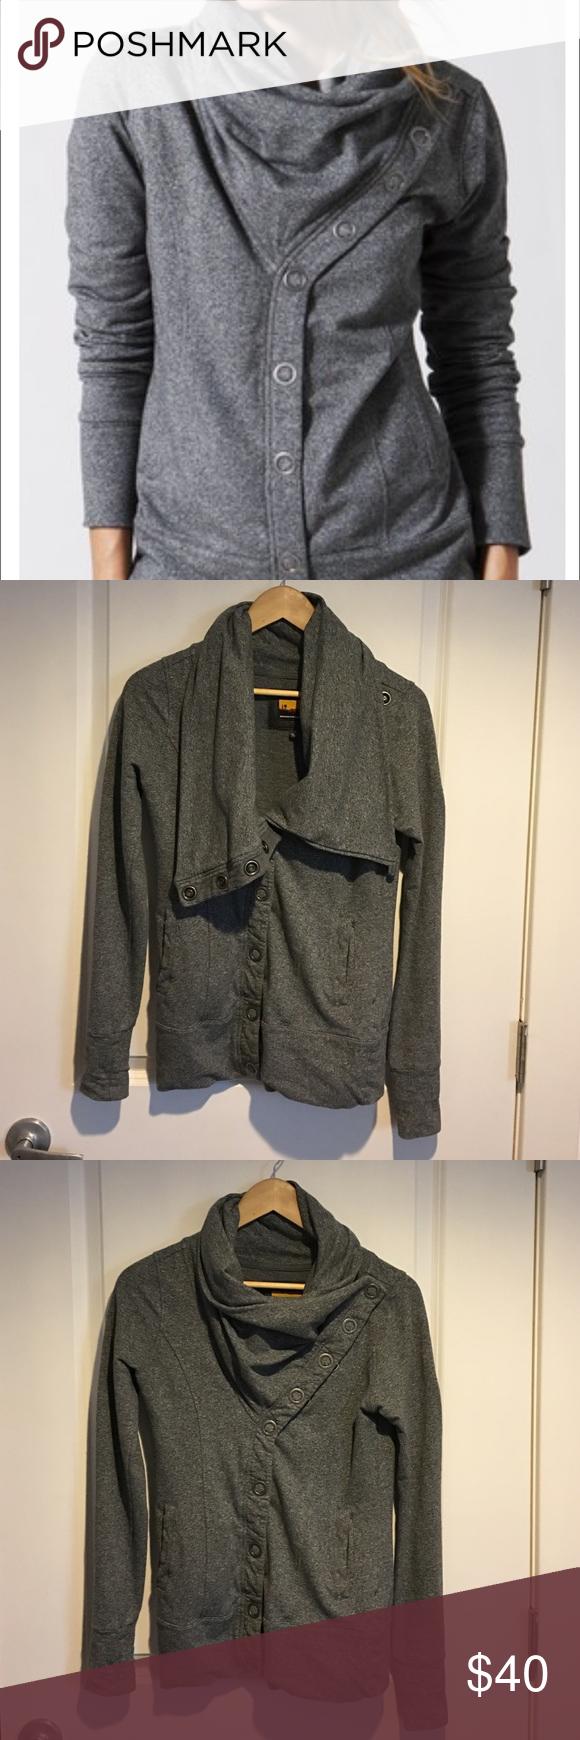 Brooklyn Industries gray sweater Brooklyn industries grey snap sweater. Brooklyn Industries Sweaters Cardigans